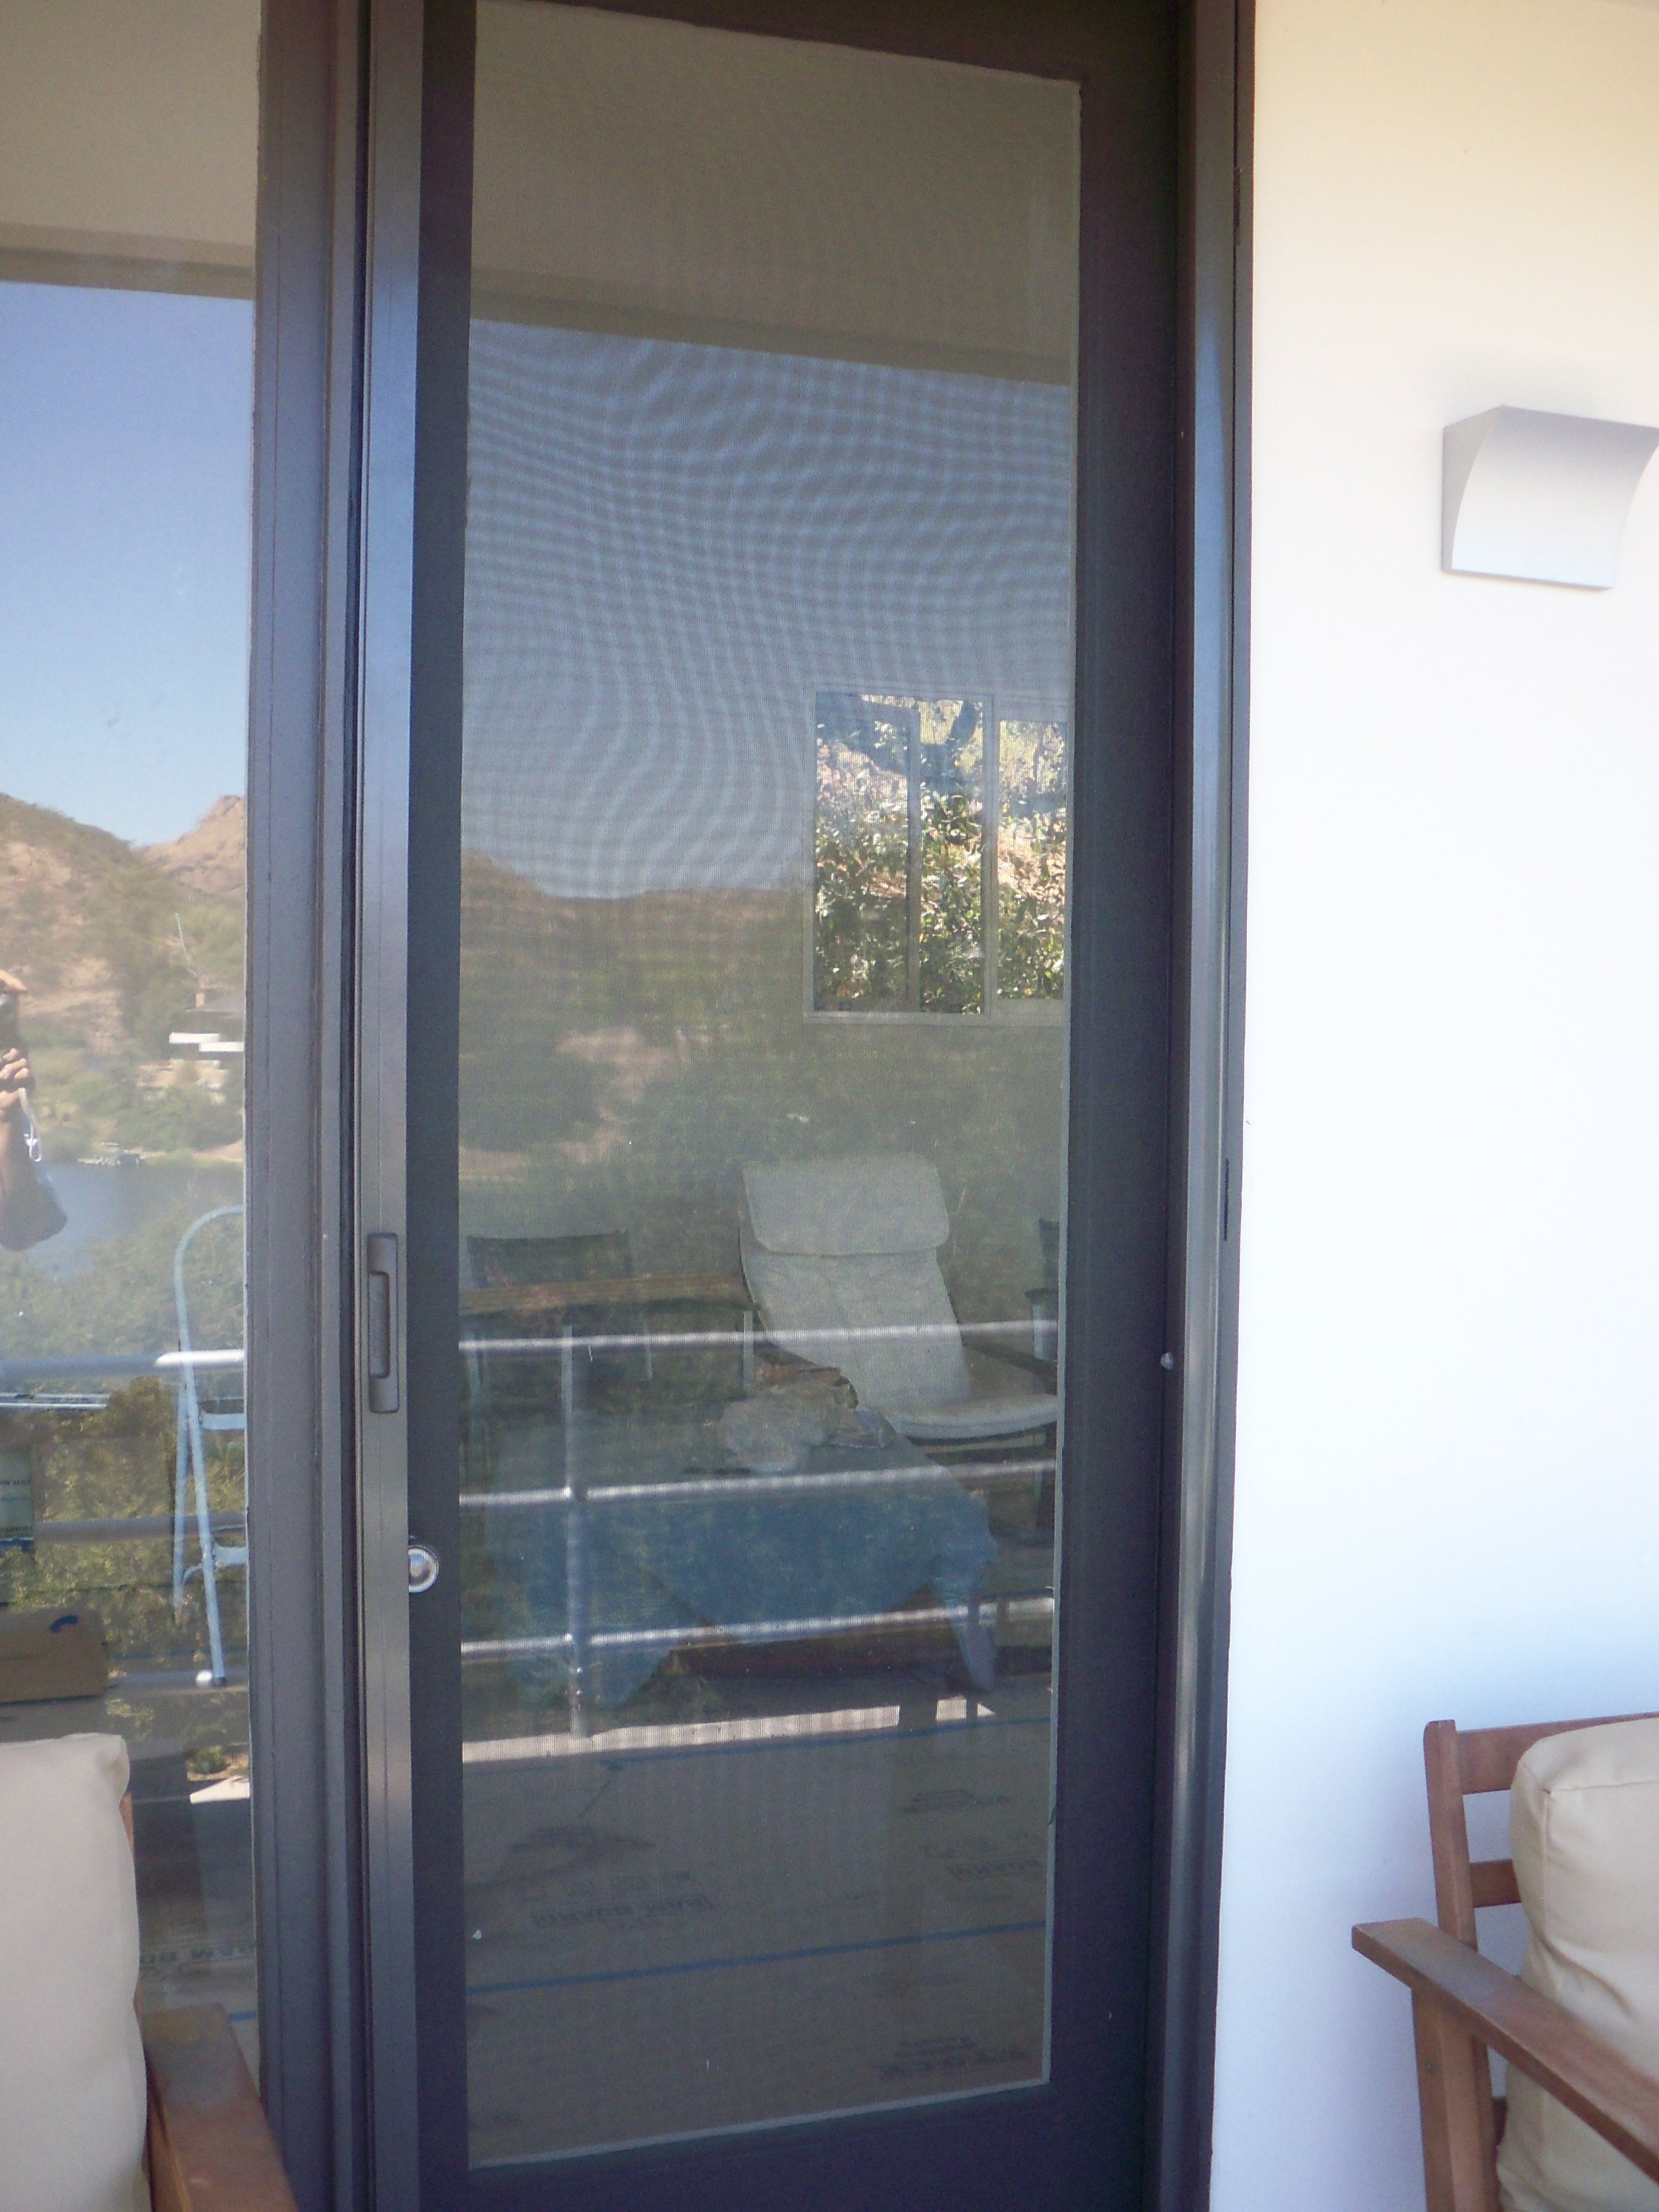 replacement window screens |